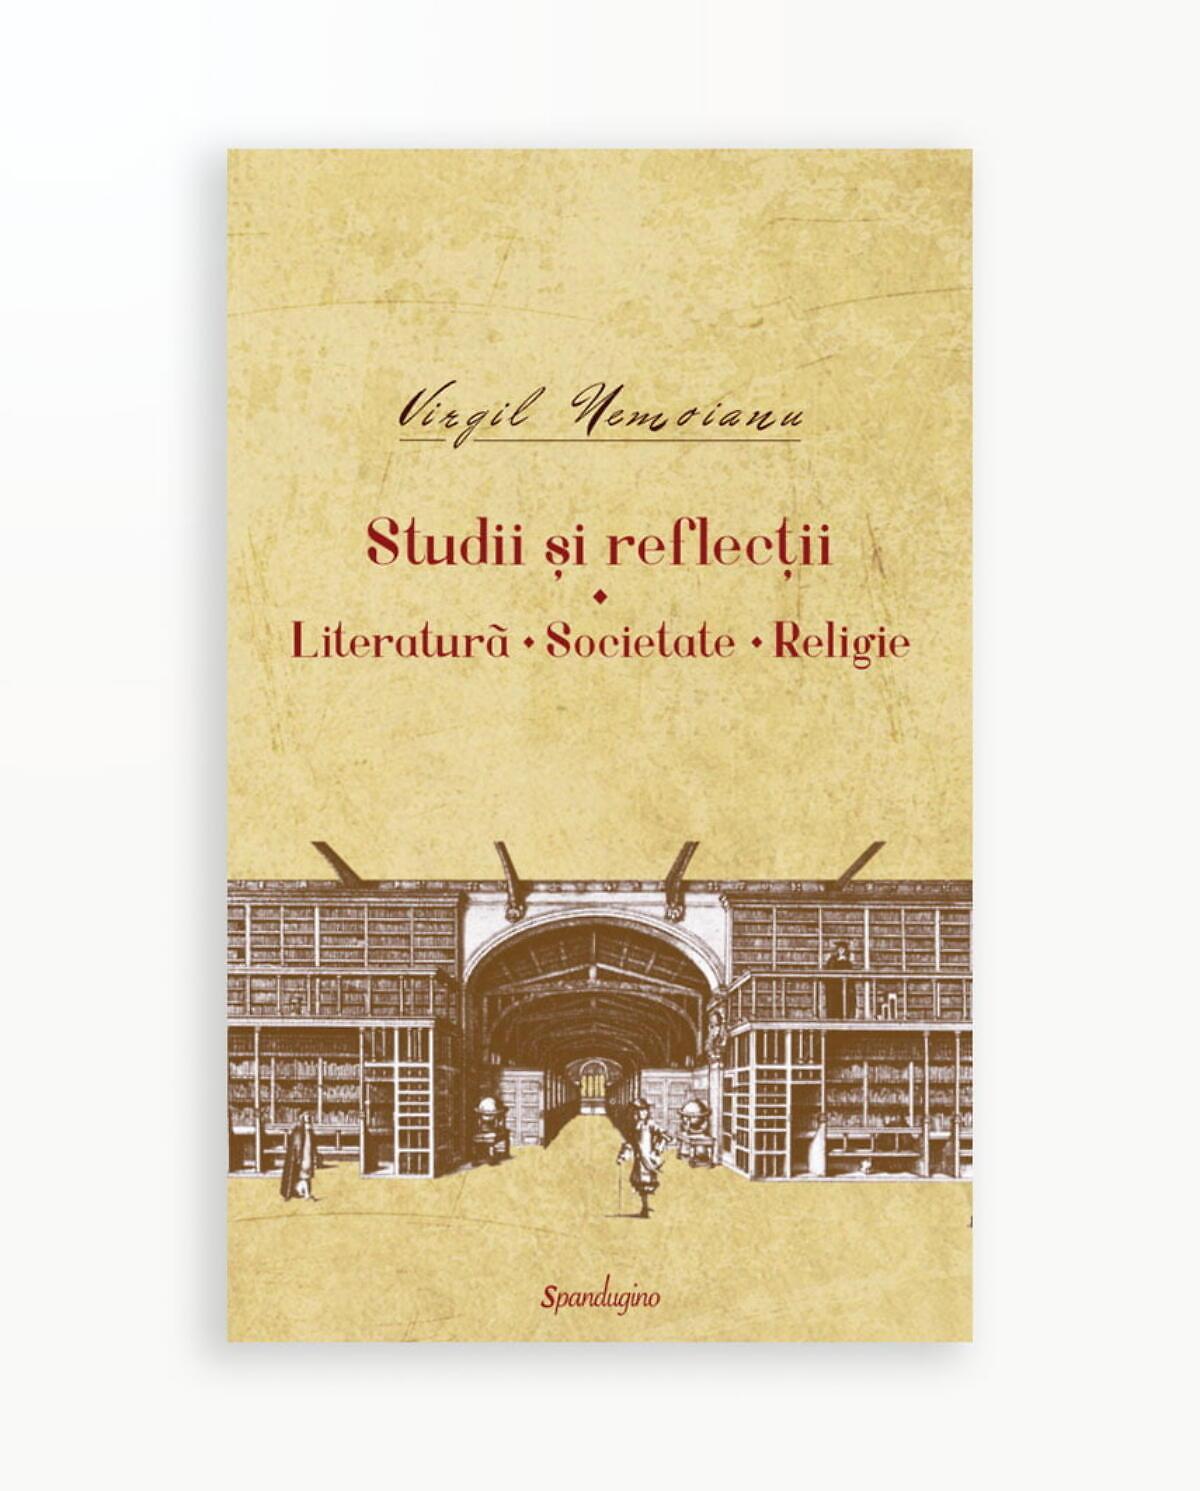 STUDII SI REFLECTII - LITERATURA - SOCIETATE - RELIGIE - Opere vol. 4